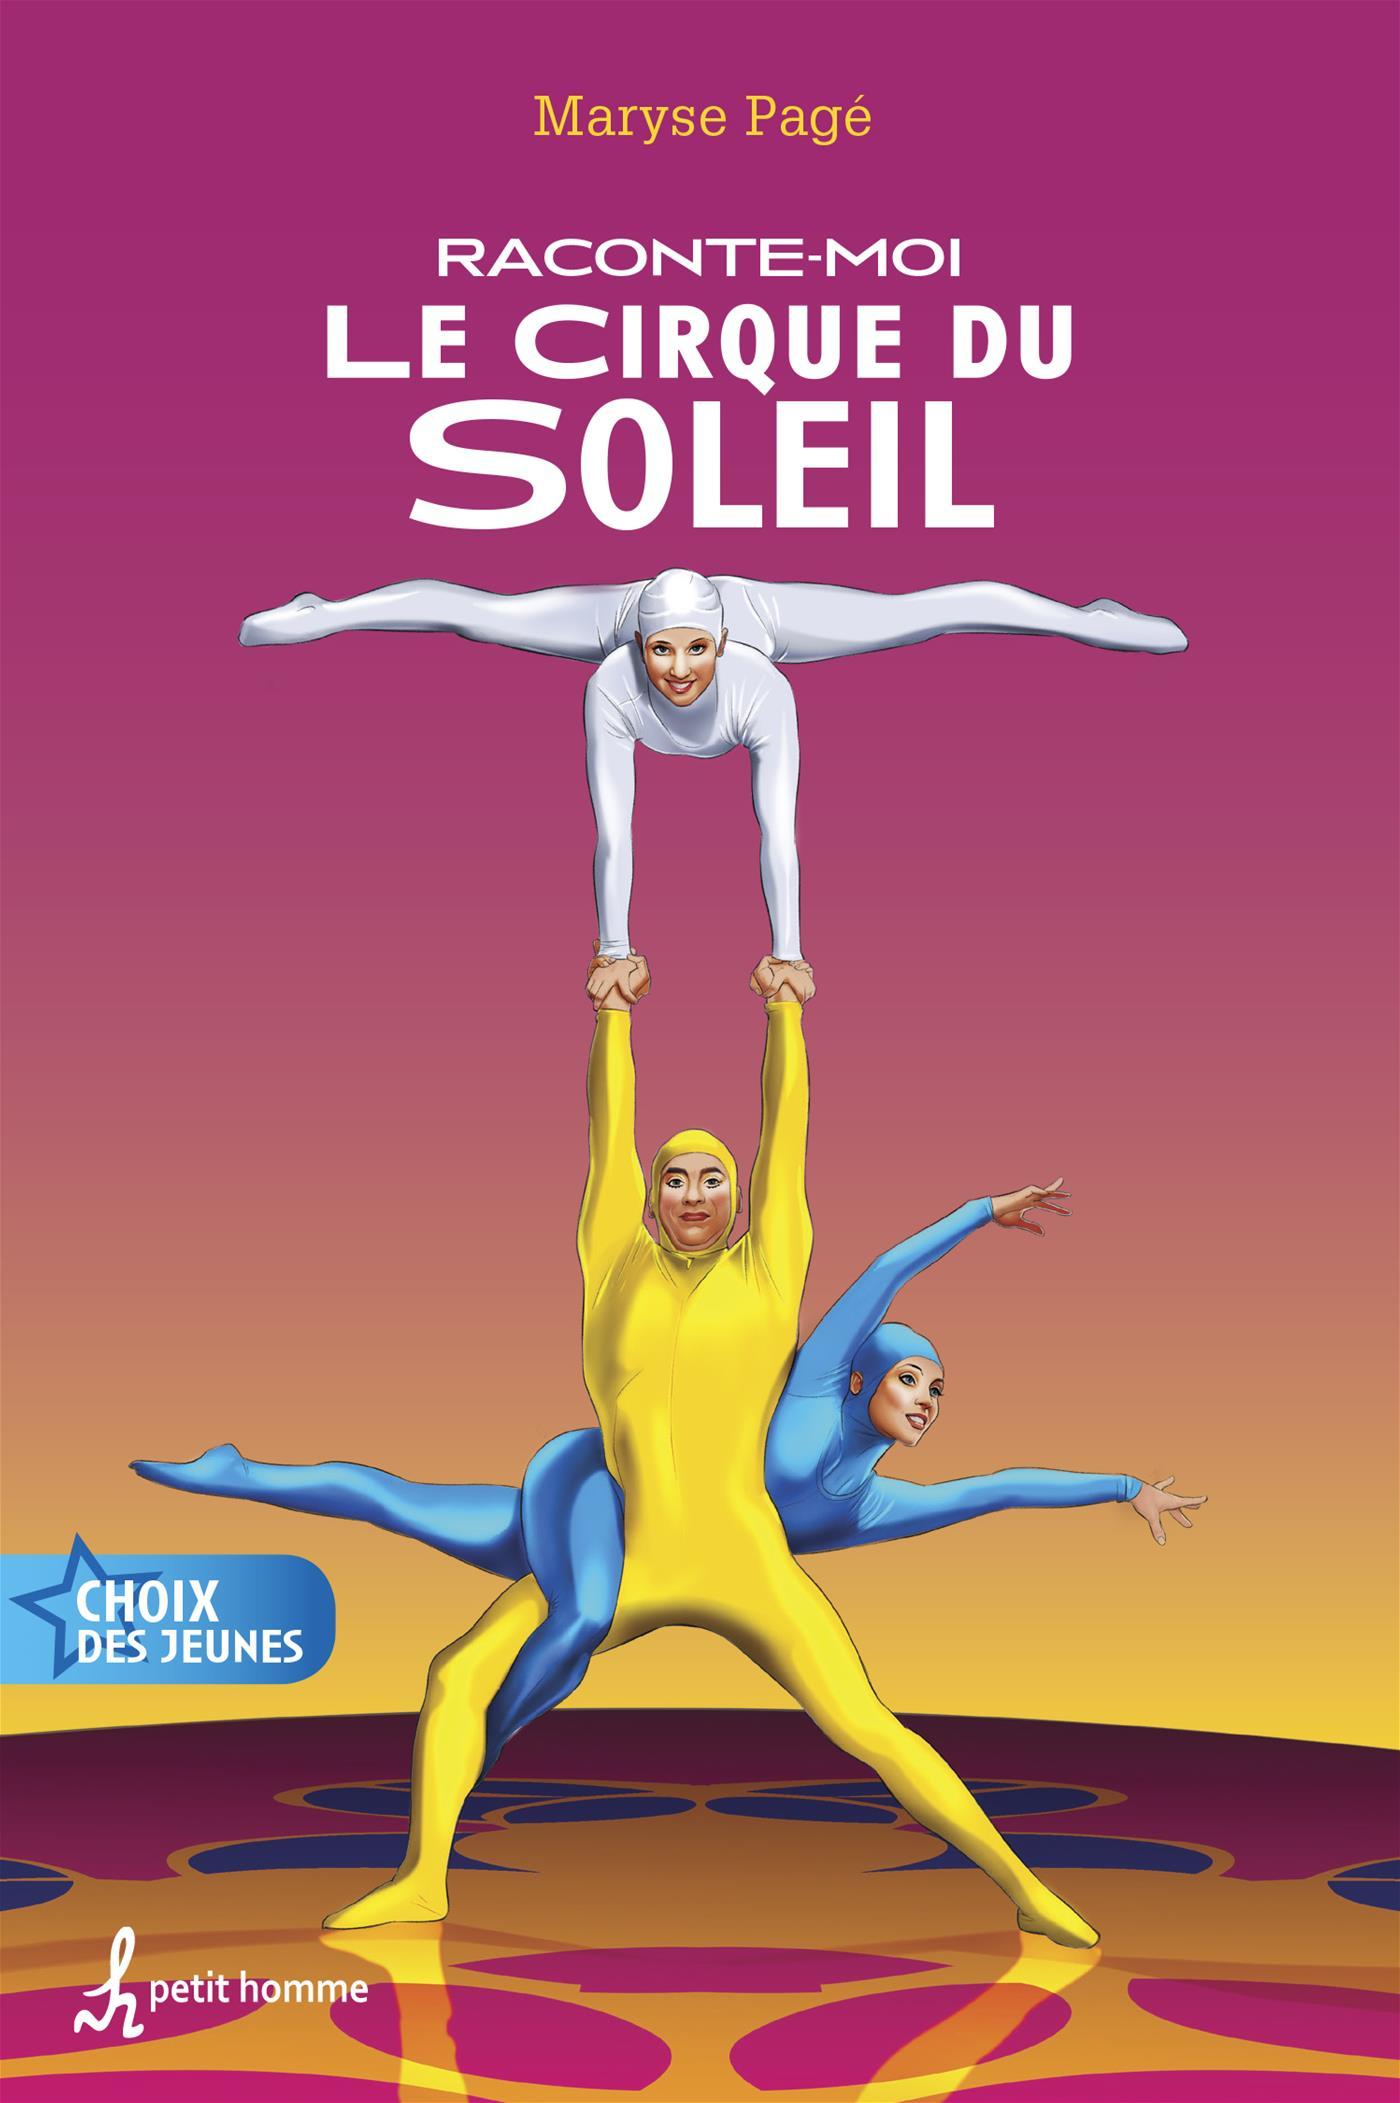 Raconte-moi le Cirque du Soleil  - Nº 37